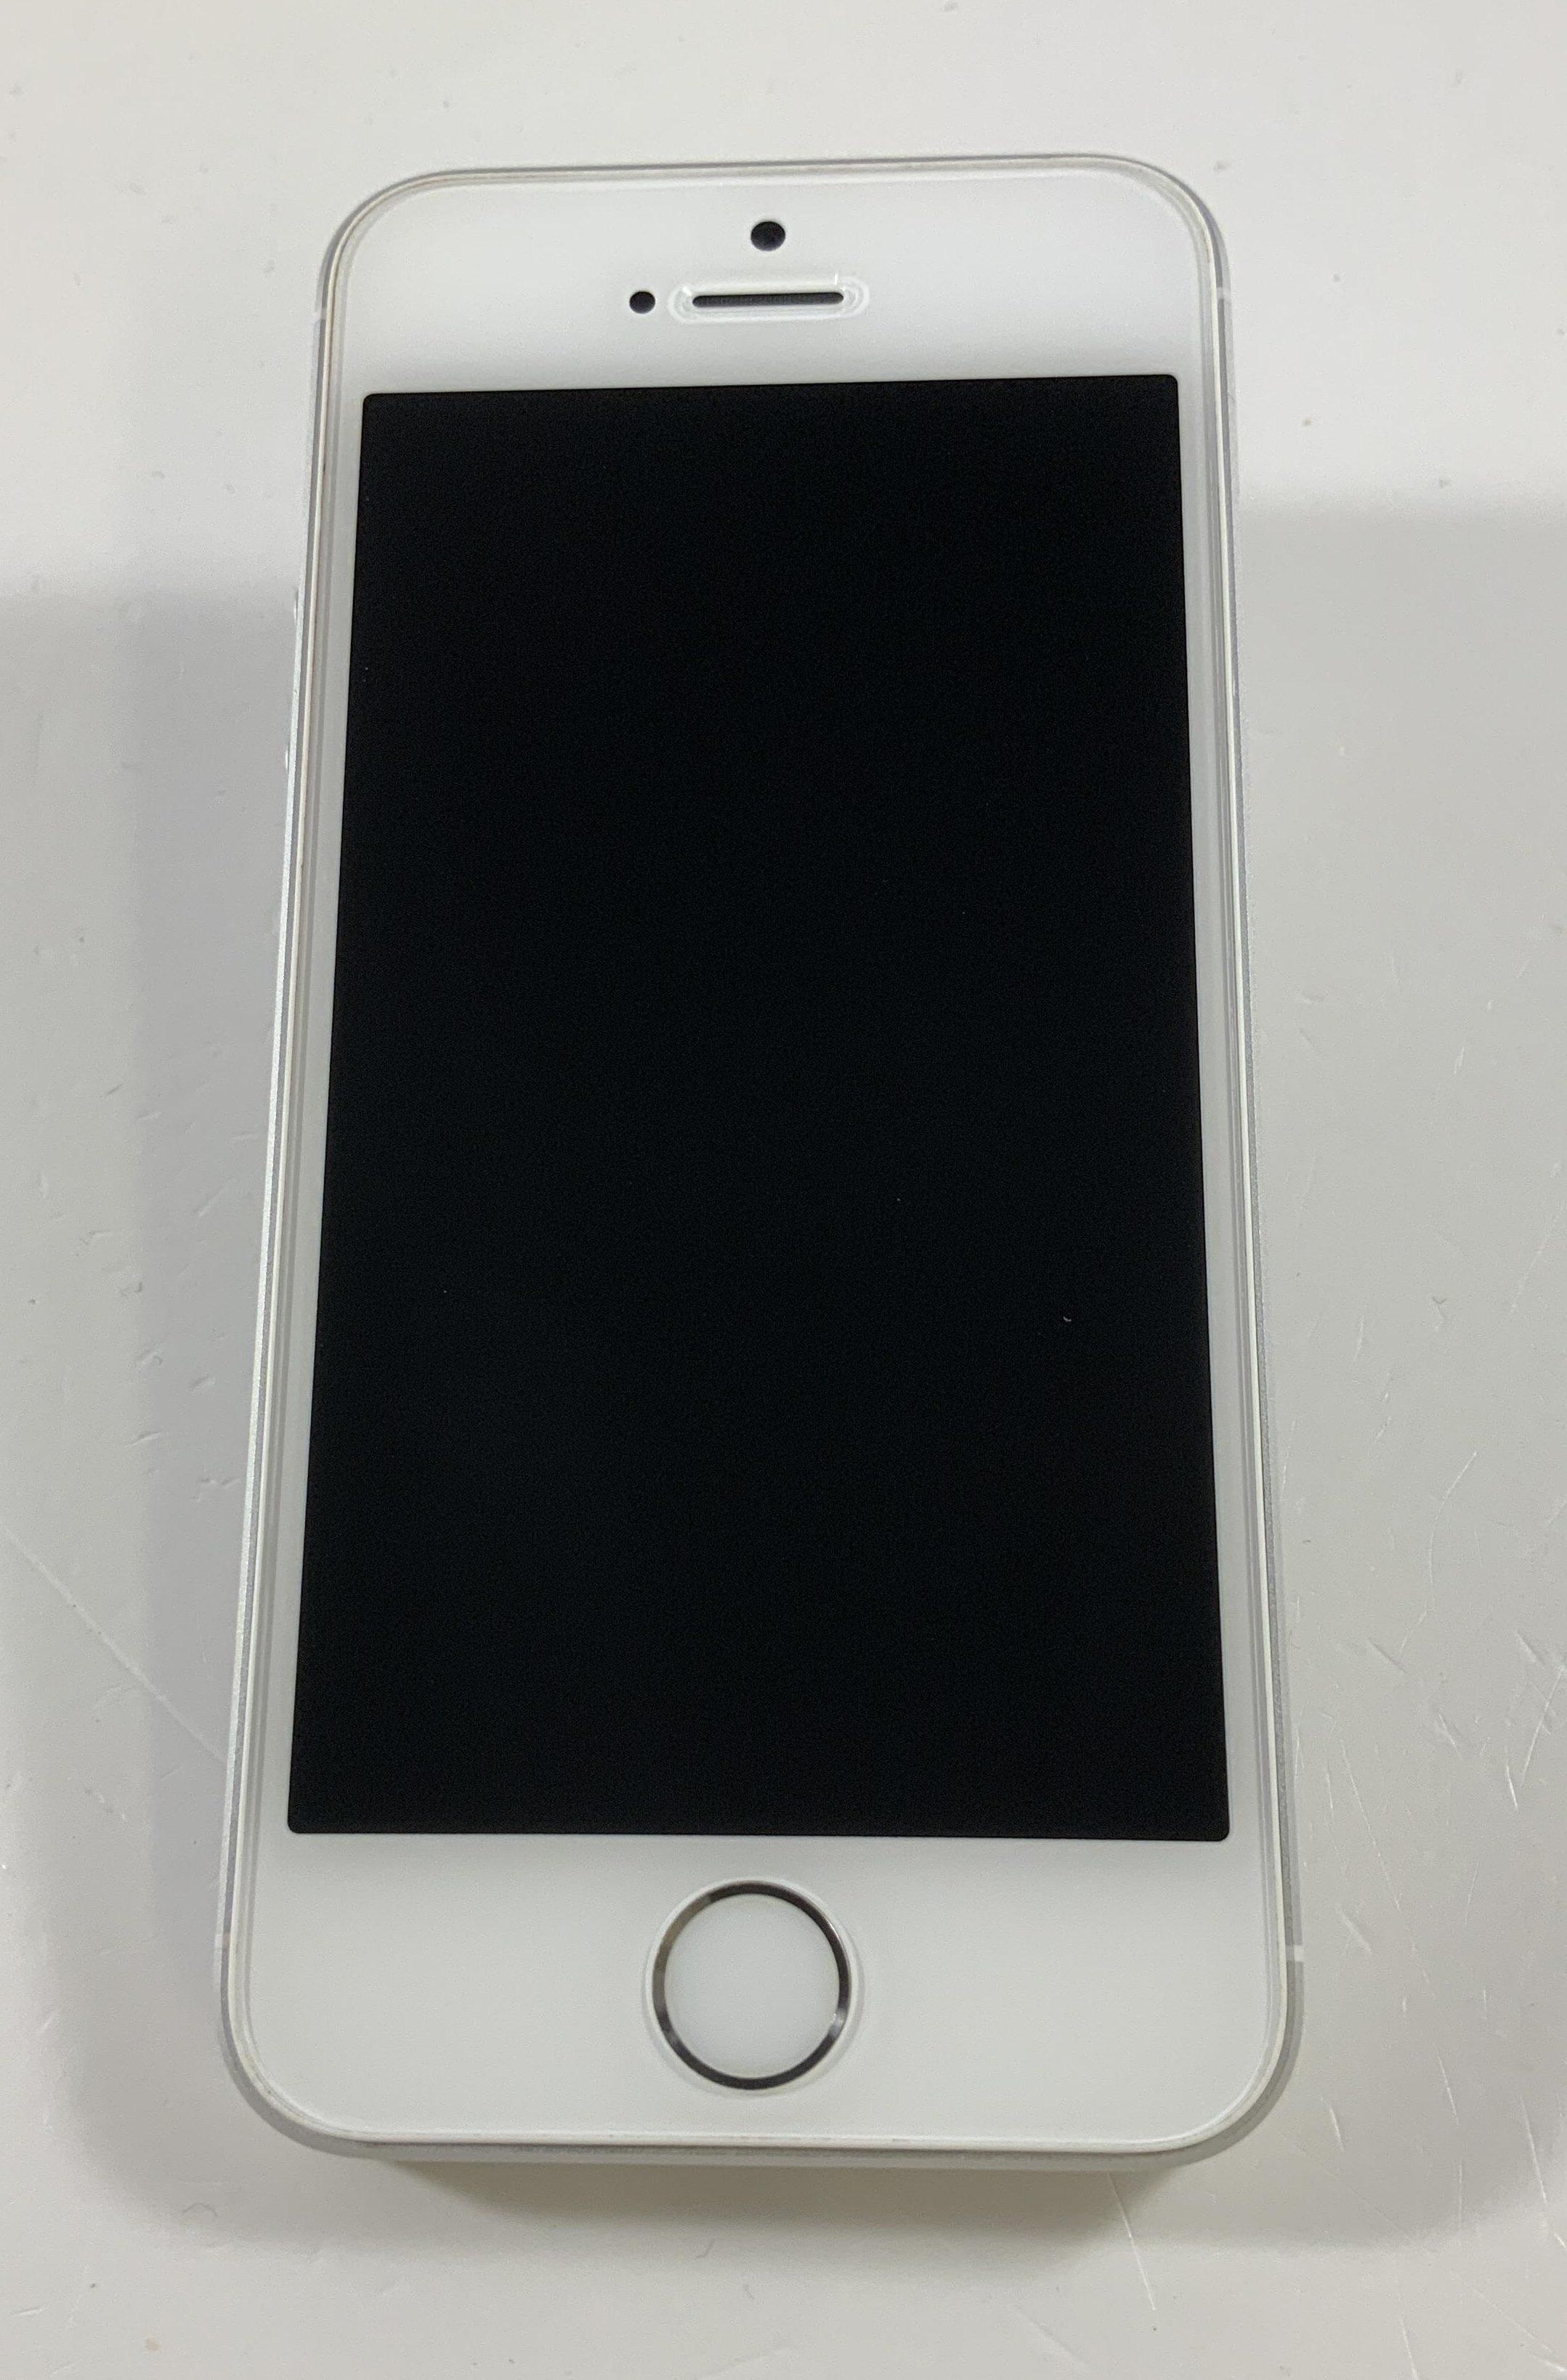 iPhone SE 32GB, 32GB, Silver, Bild 1